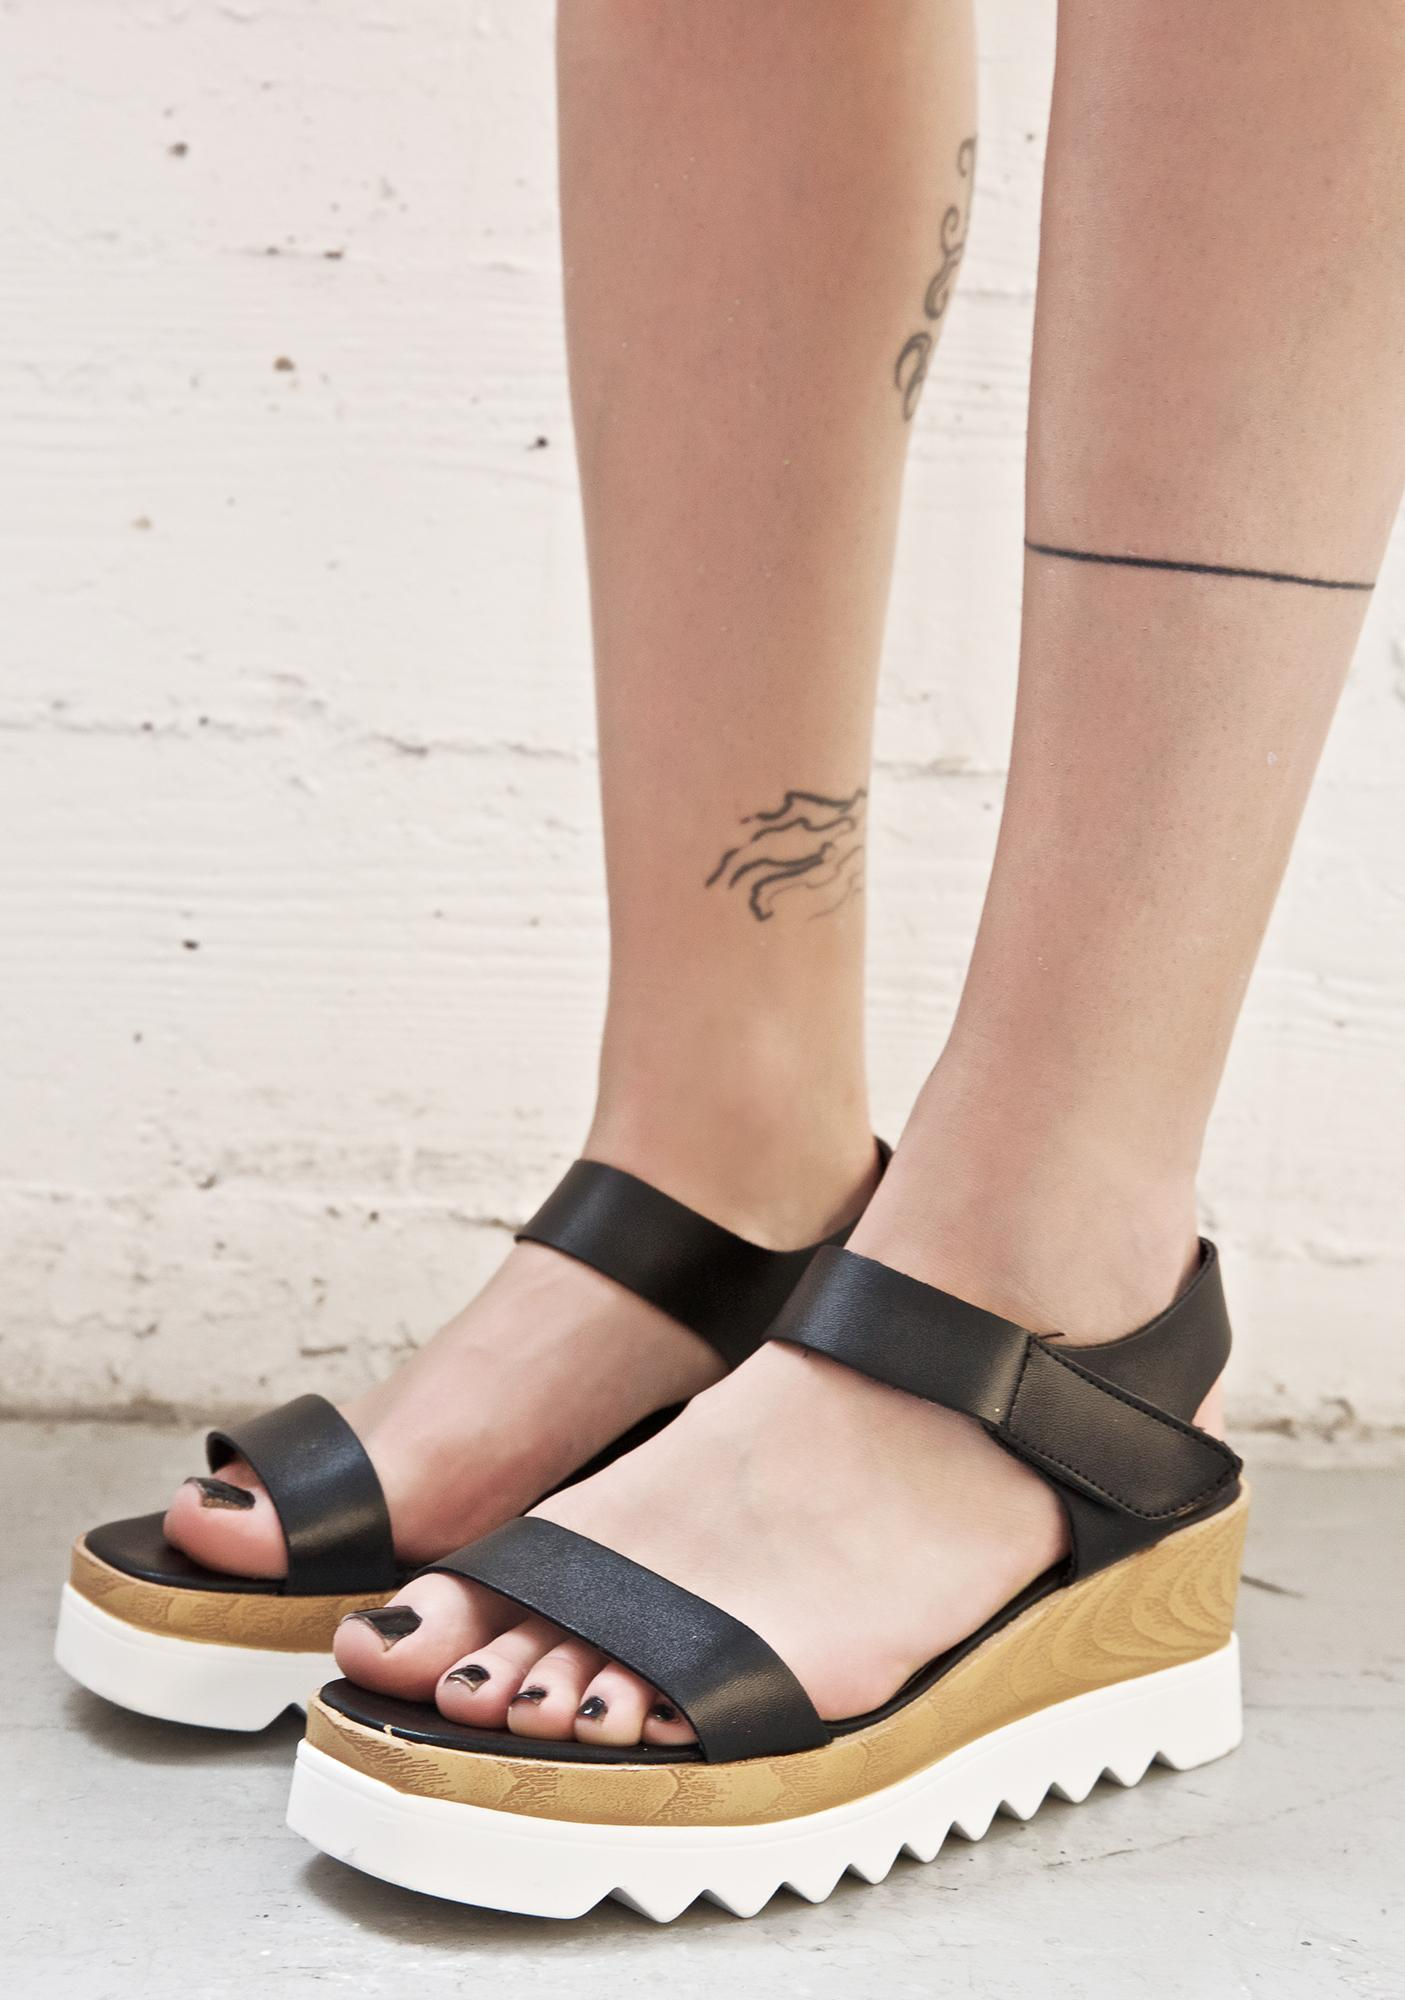 pebble beach platform sandals dolls kill. Black Bedroom Furniture Sets. Home Design Ideas